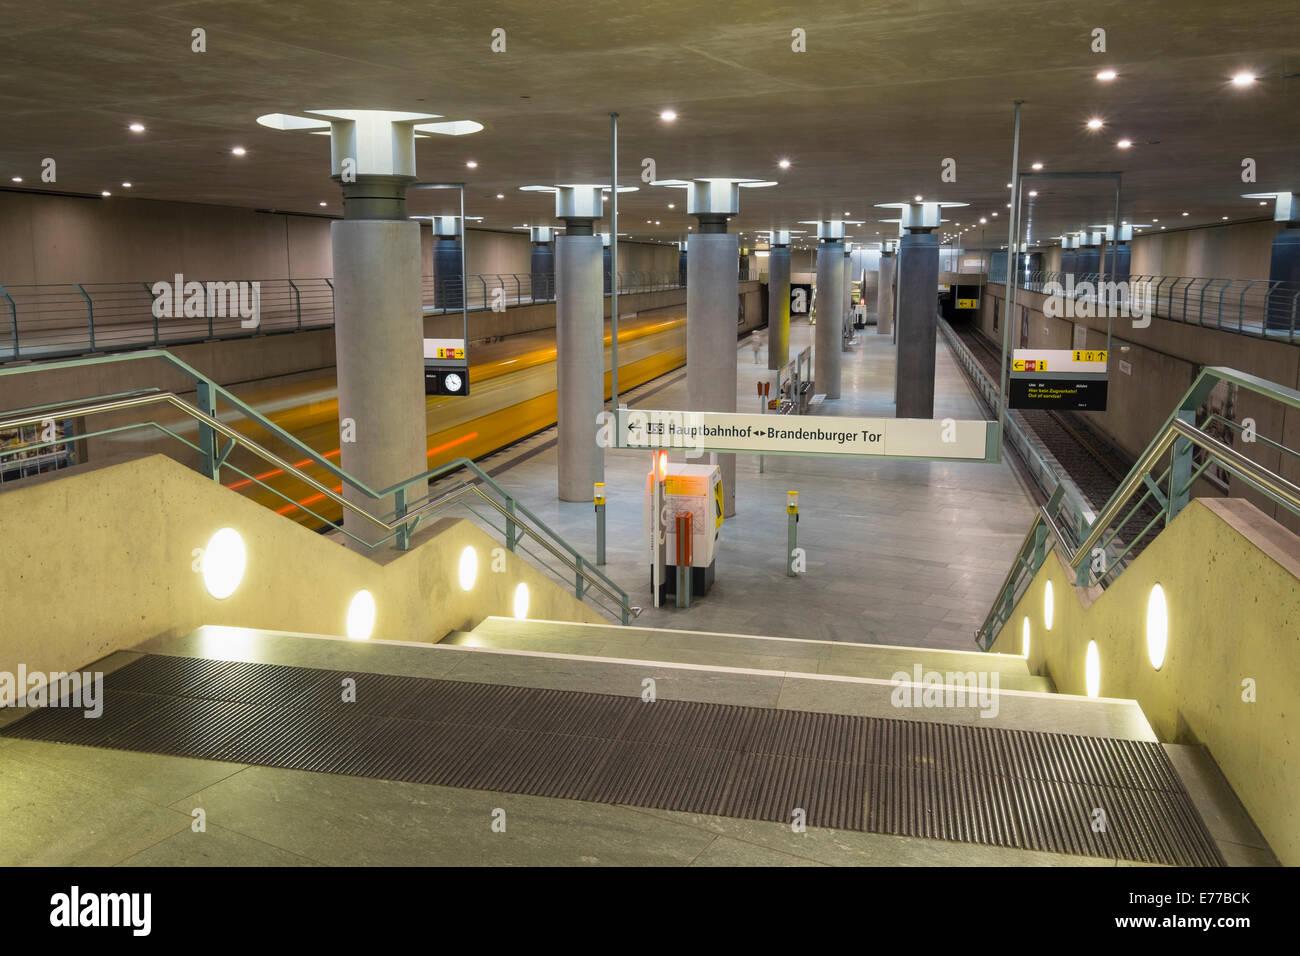 train at platform at Bundestag subway station in Berlin Germany - Stock Image